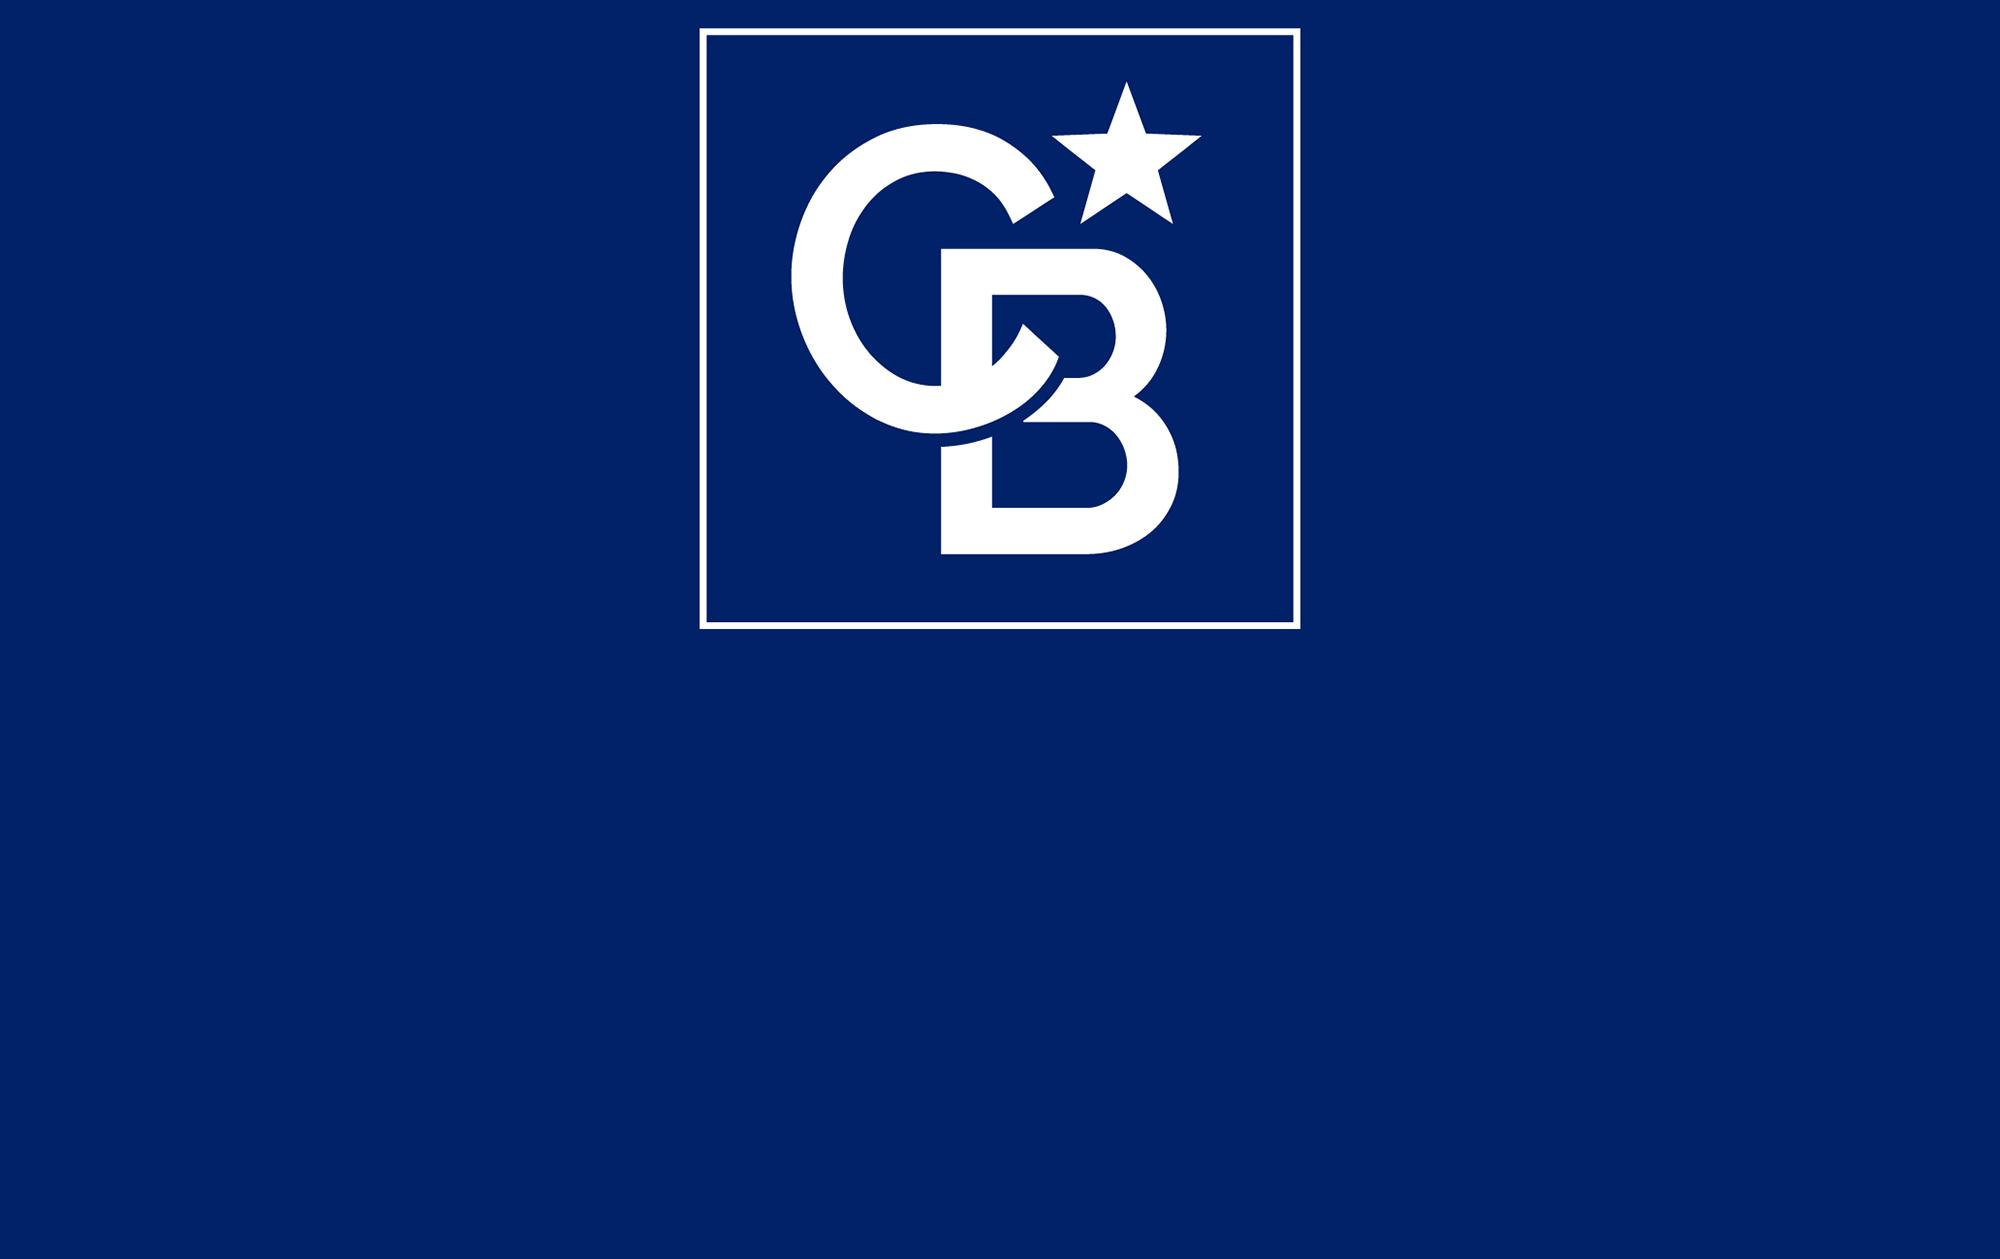 Craig Power - Coldwell Banker Hubbell BriarWood Logo